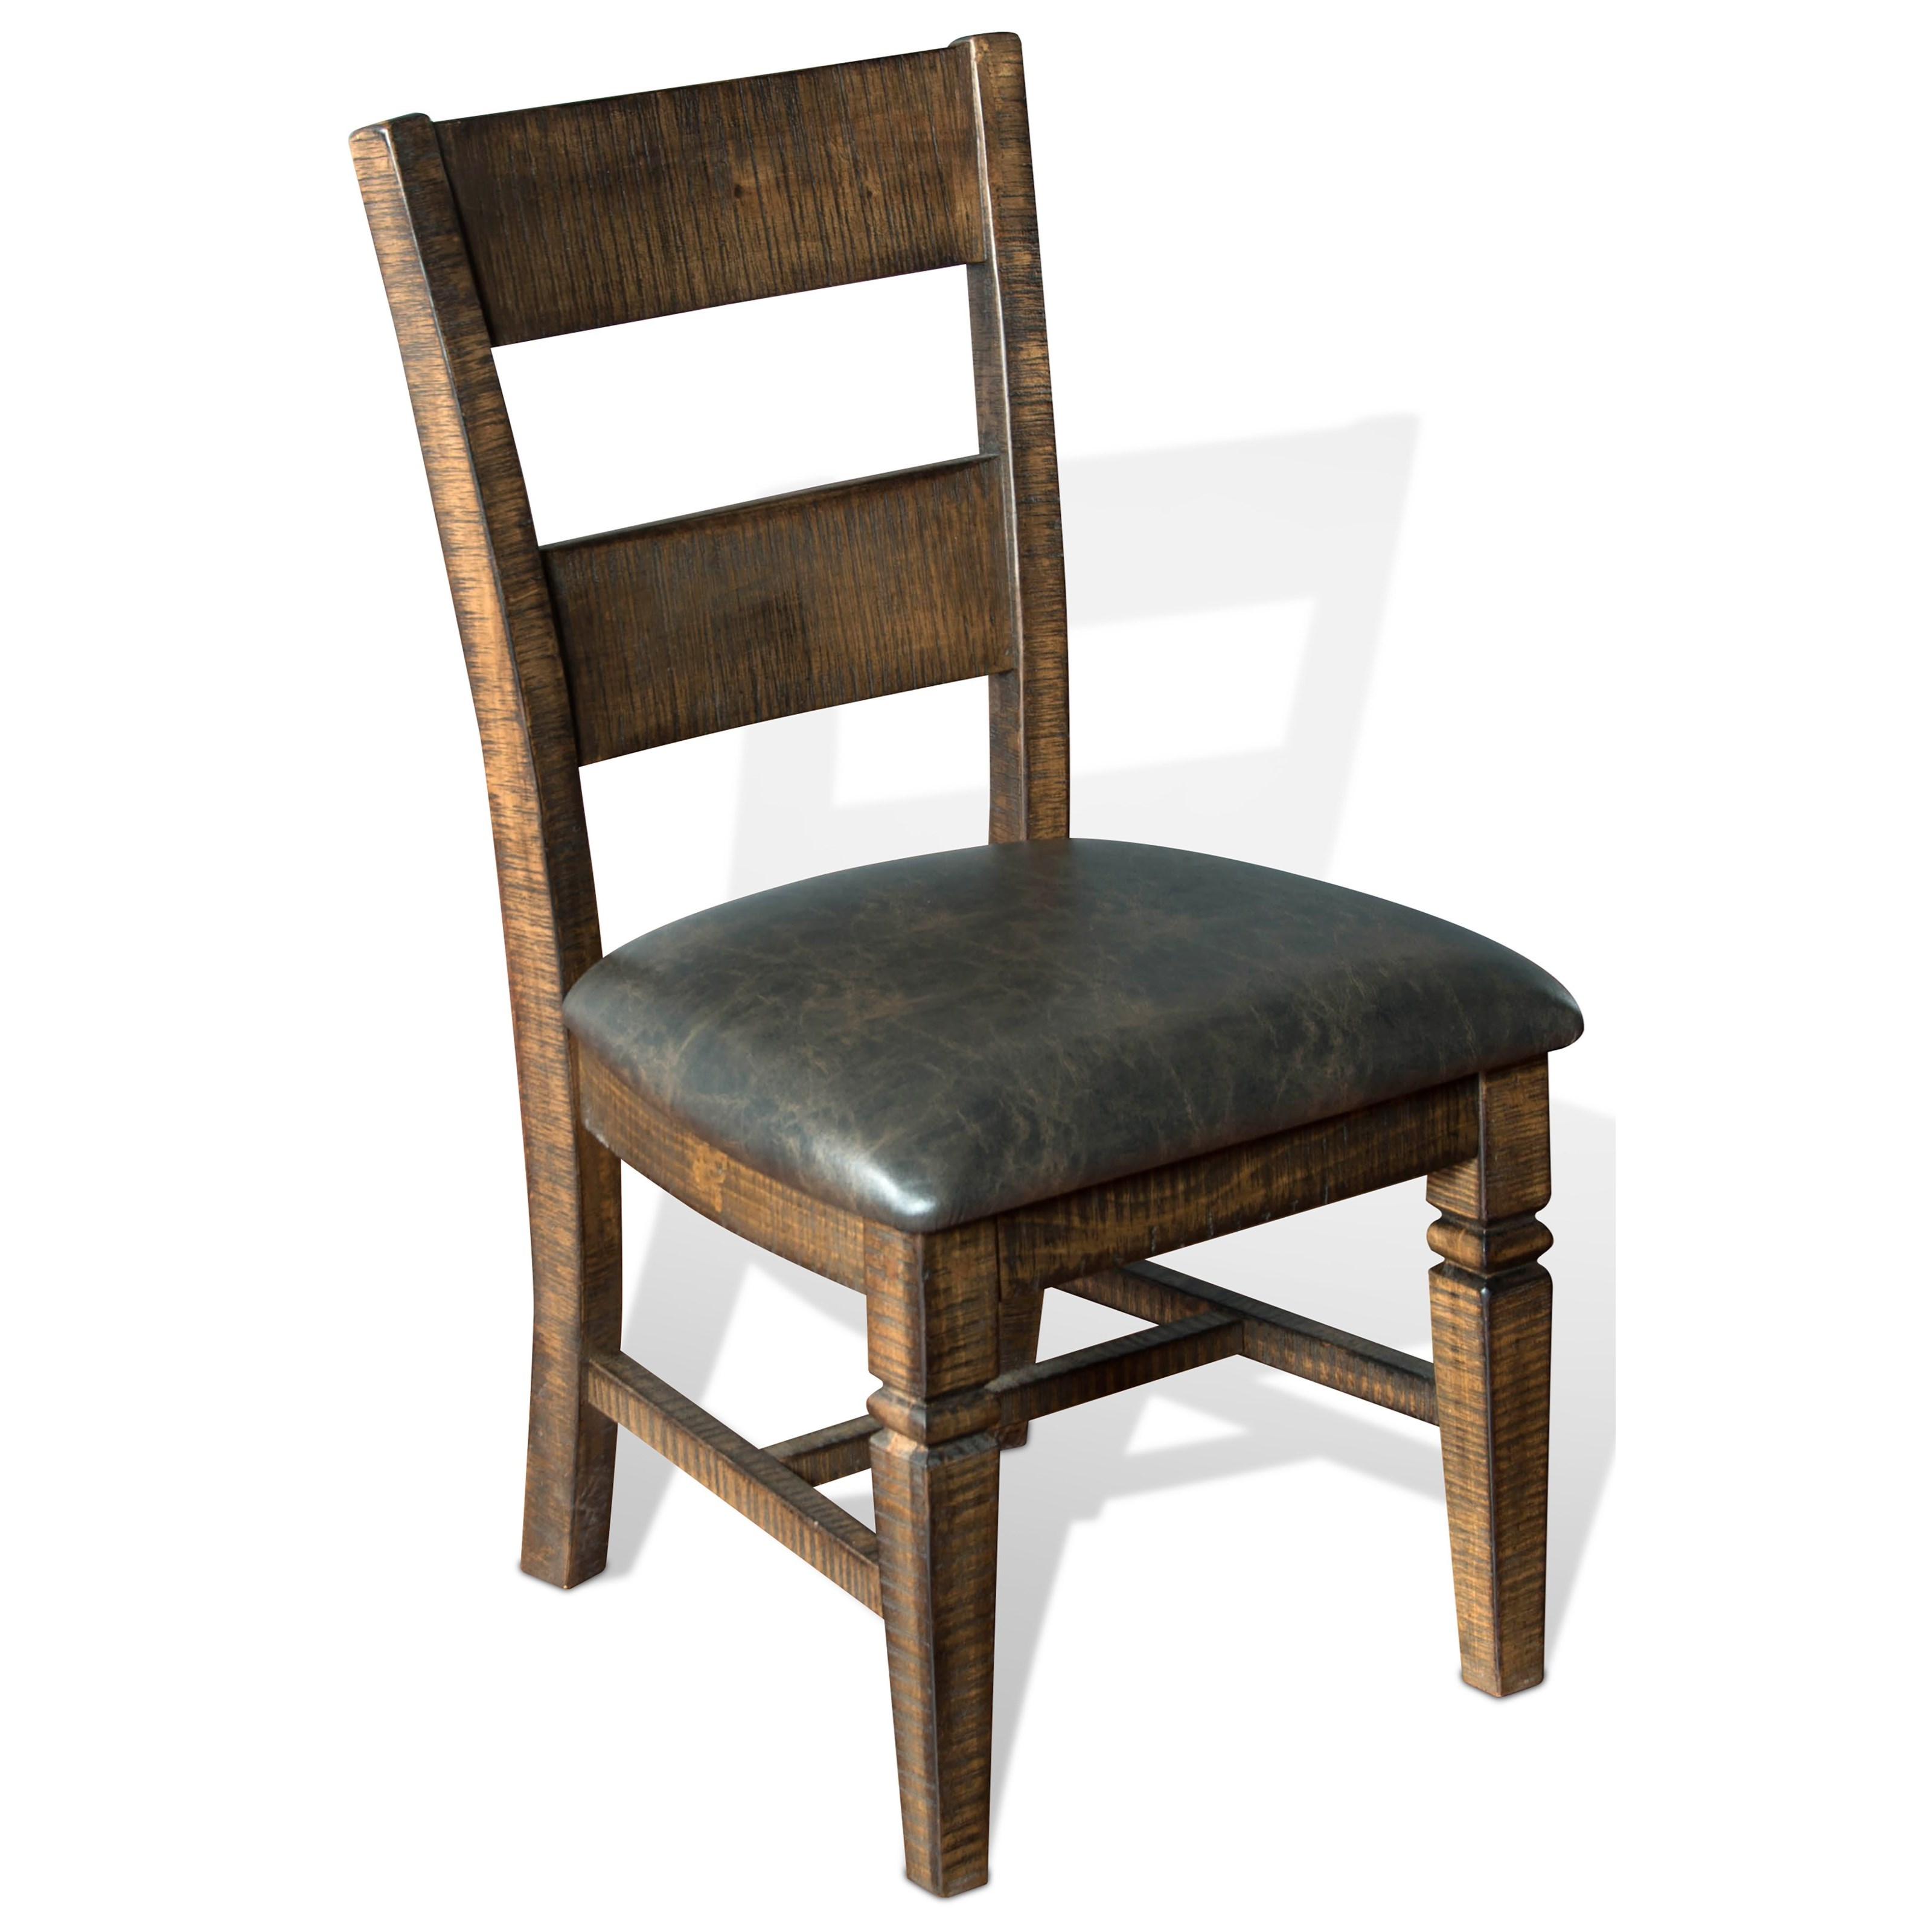 Sunny Designs Homestead Ladderback Chair w/ Cushion Seat - Item Number: 1429TL